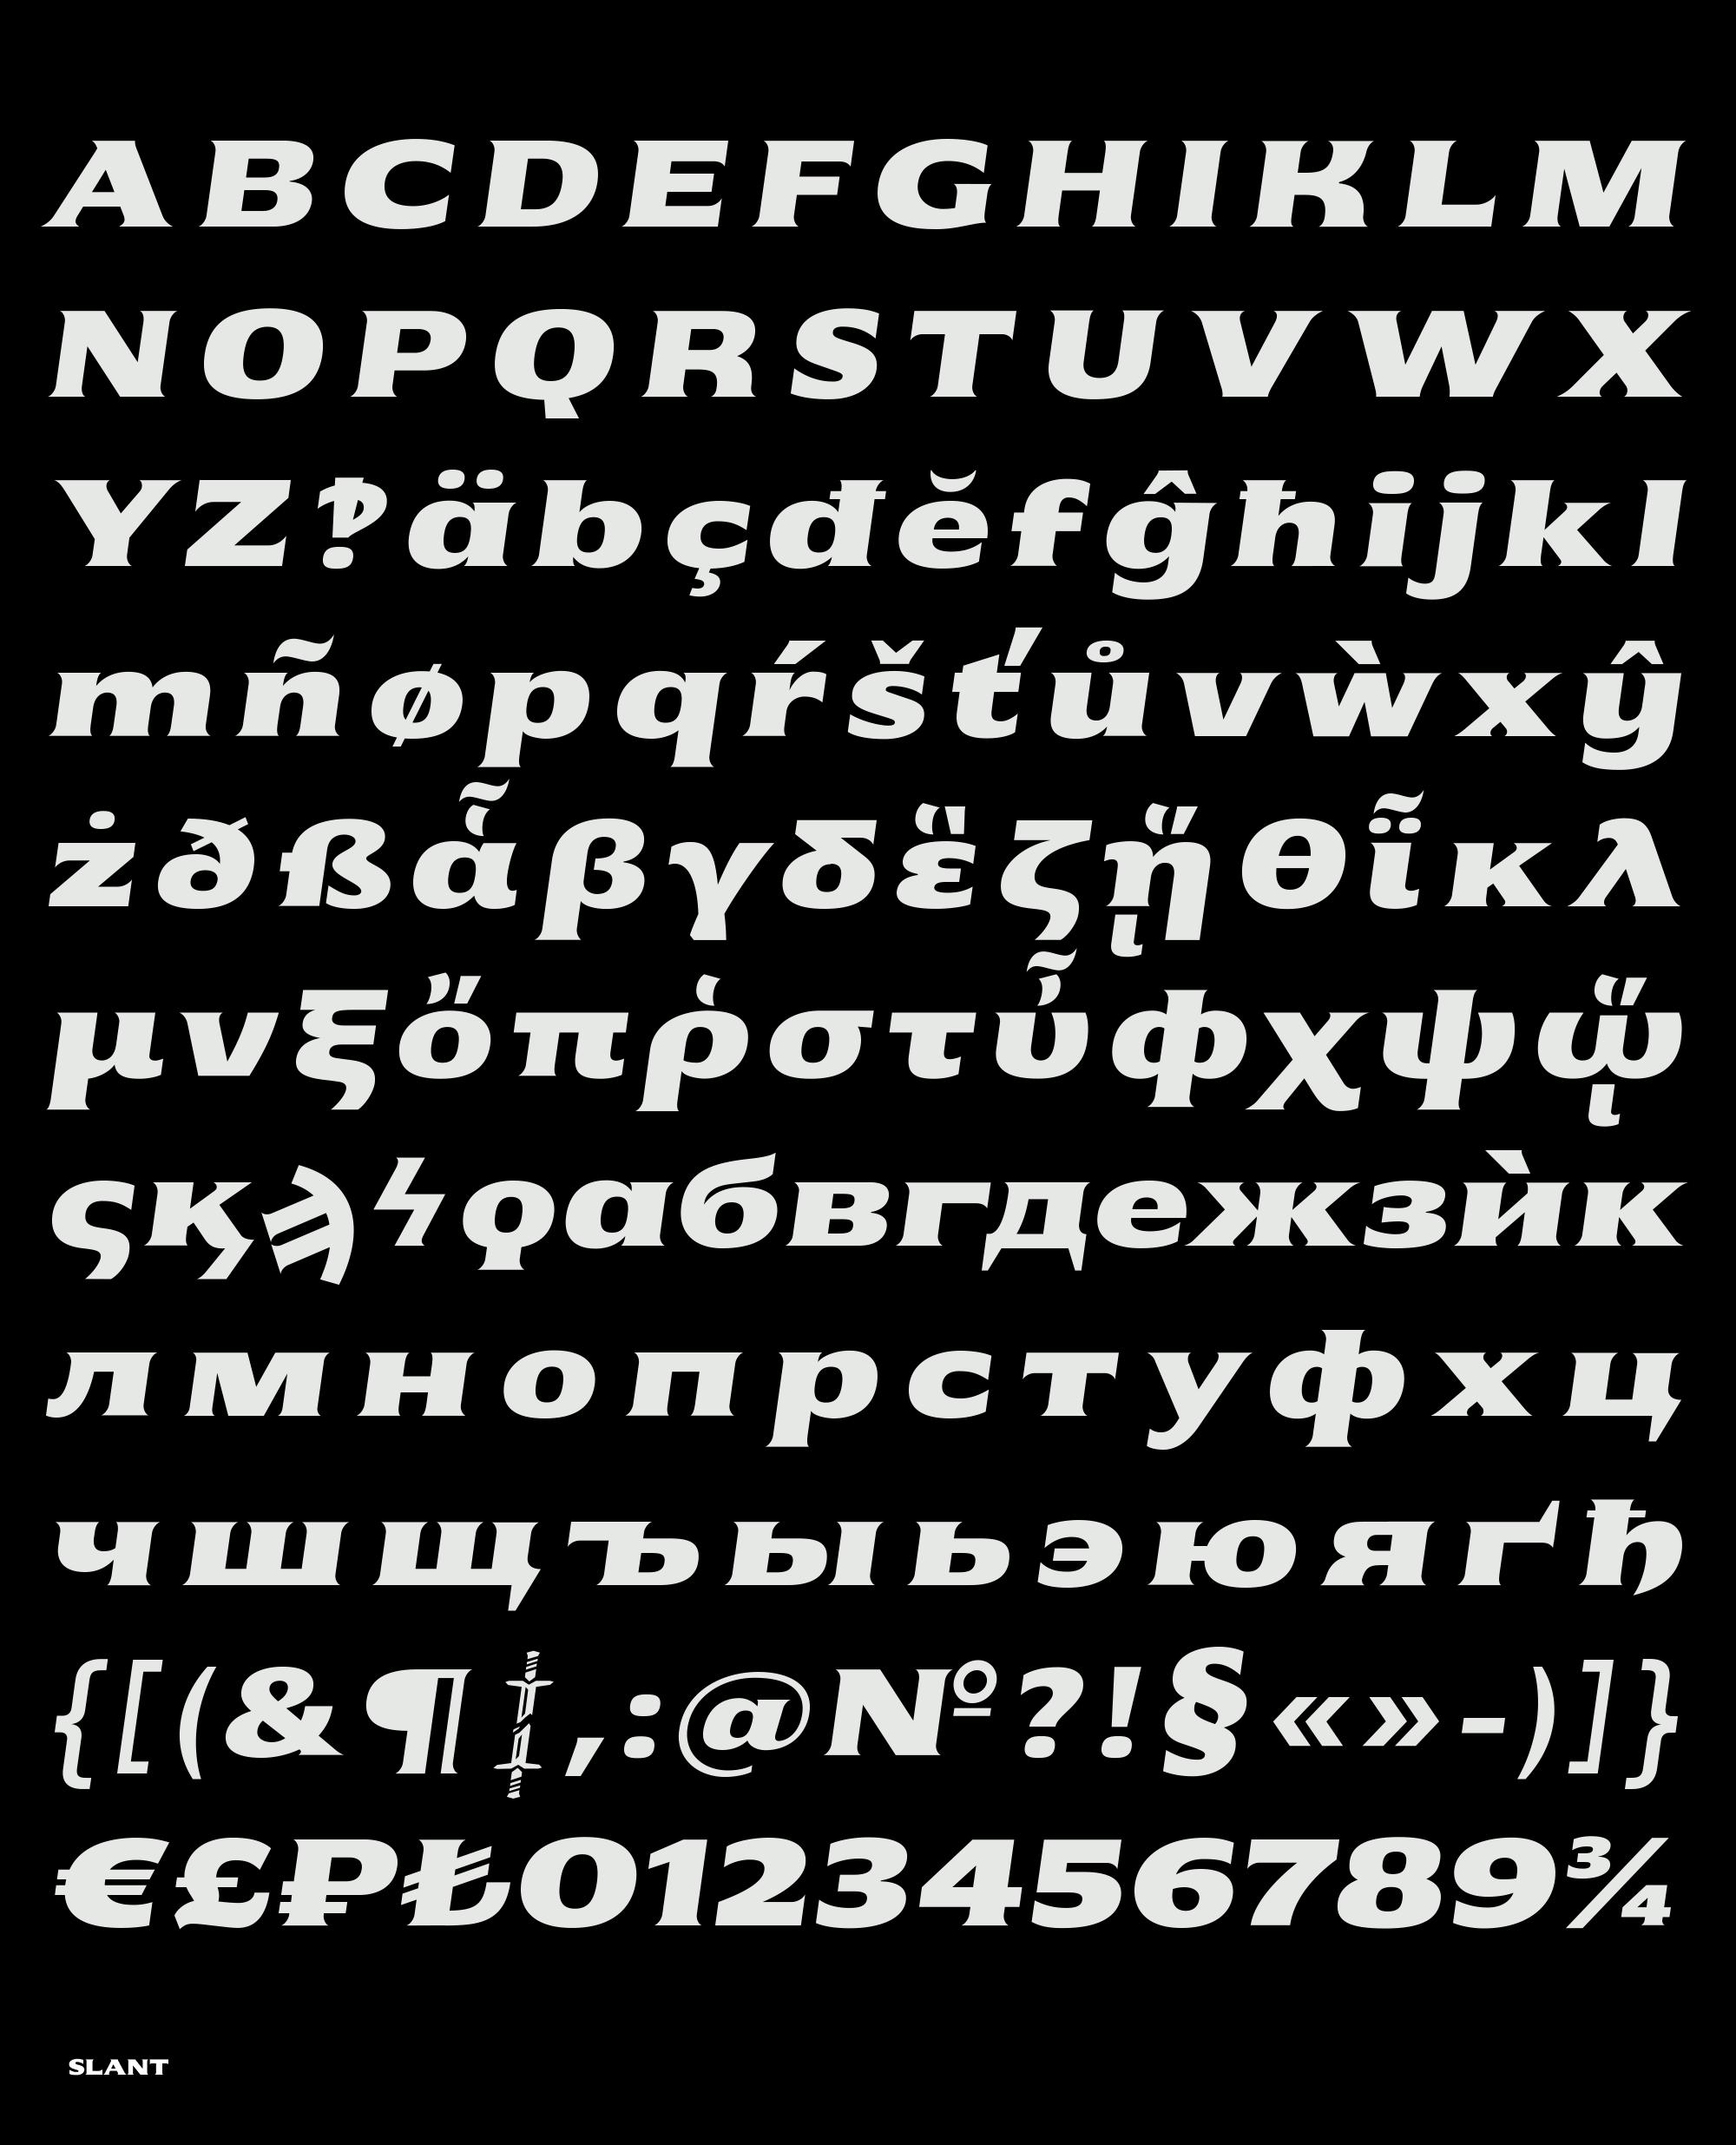 Alphabet slant